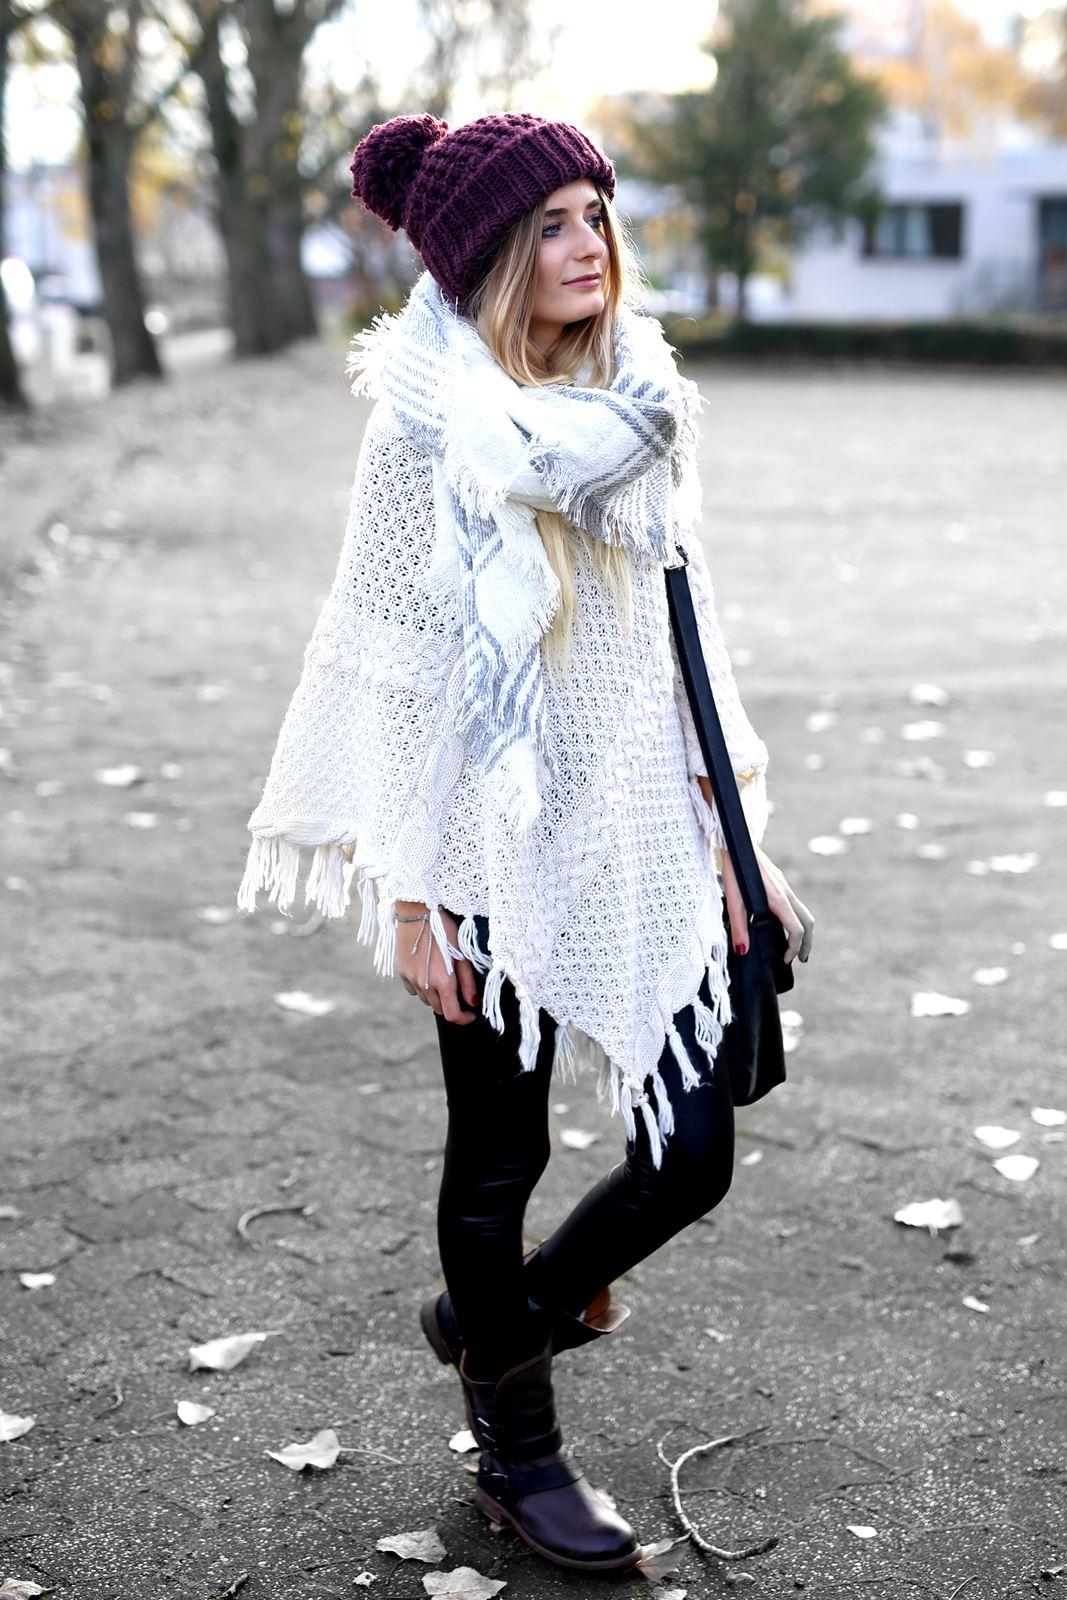 modeblog-german-fashion-blog-herbst-outfit-poncho-xxl-schal-7